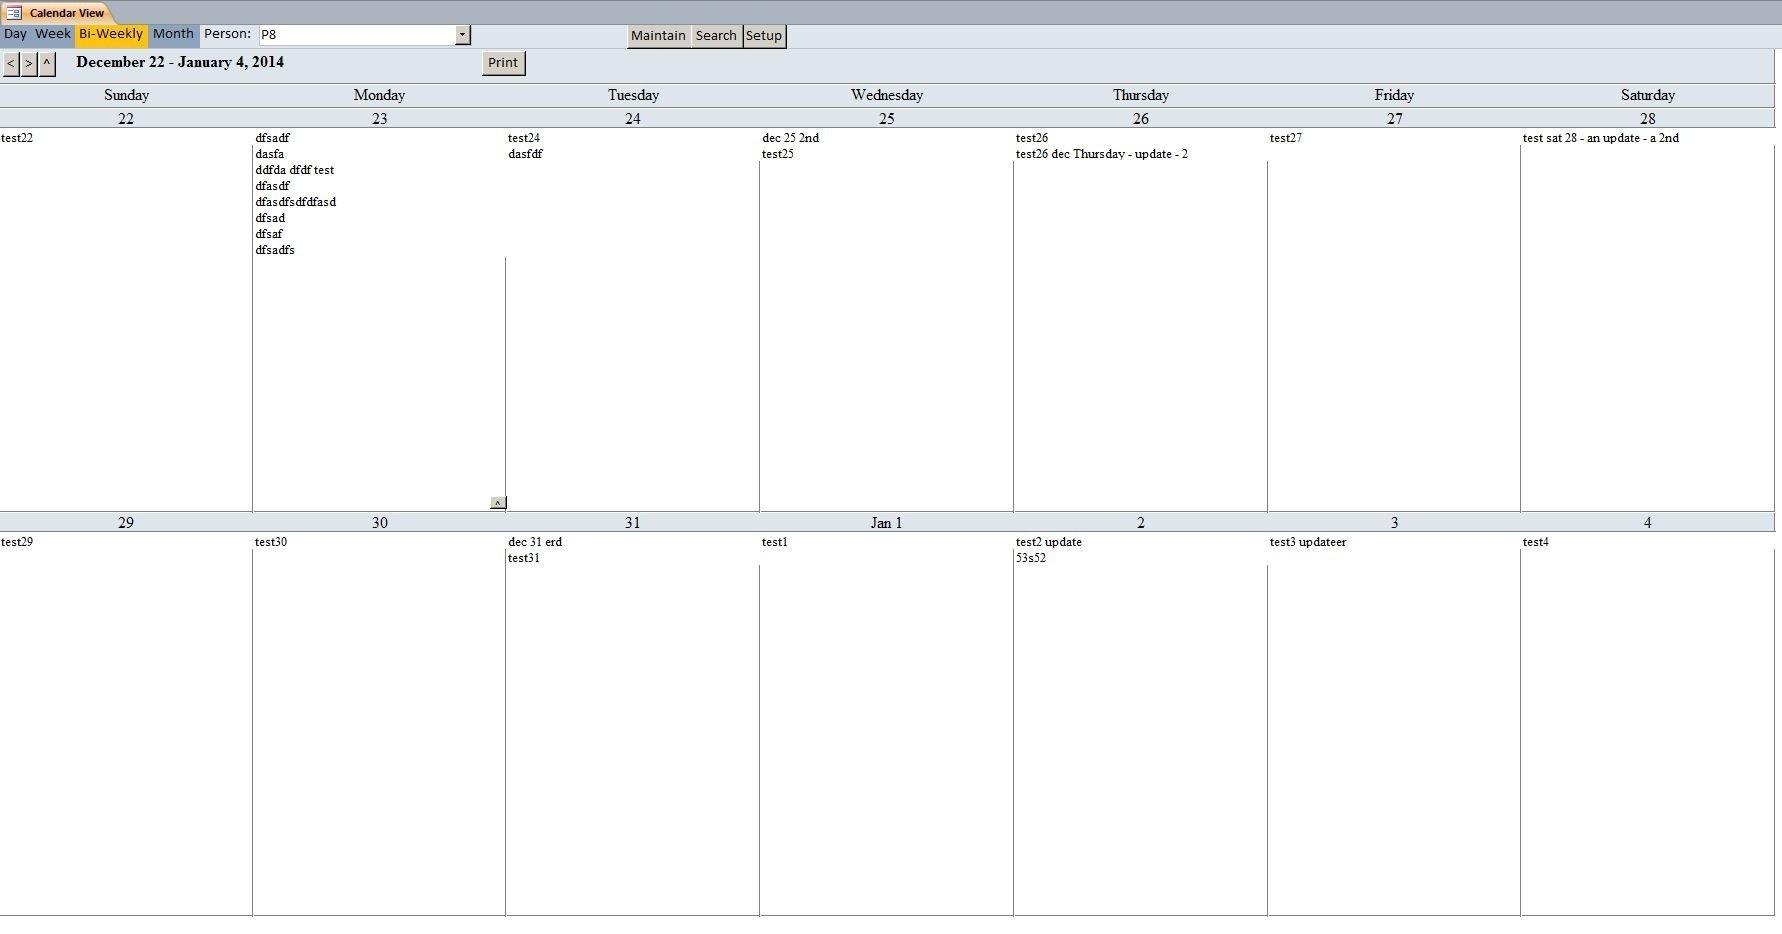 010 Template Ideas Weekly Calendar For Word Free Printable Templates regarding Blank Two Week Schedule Template